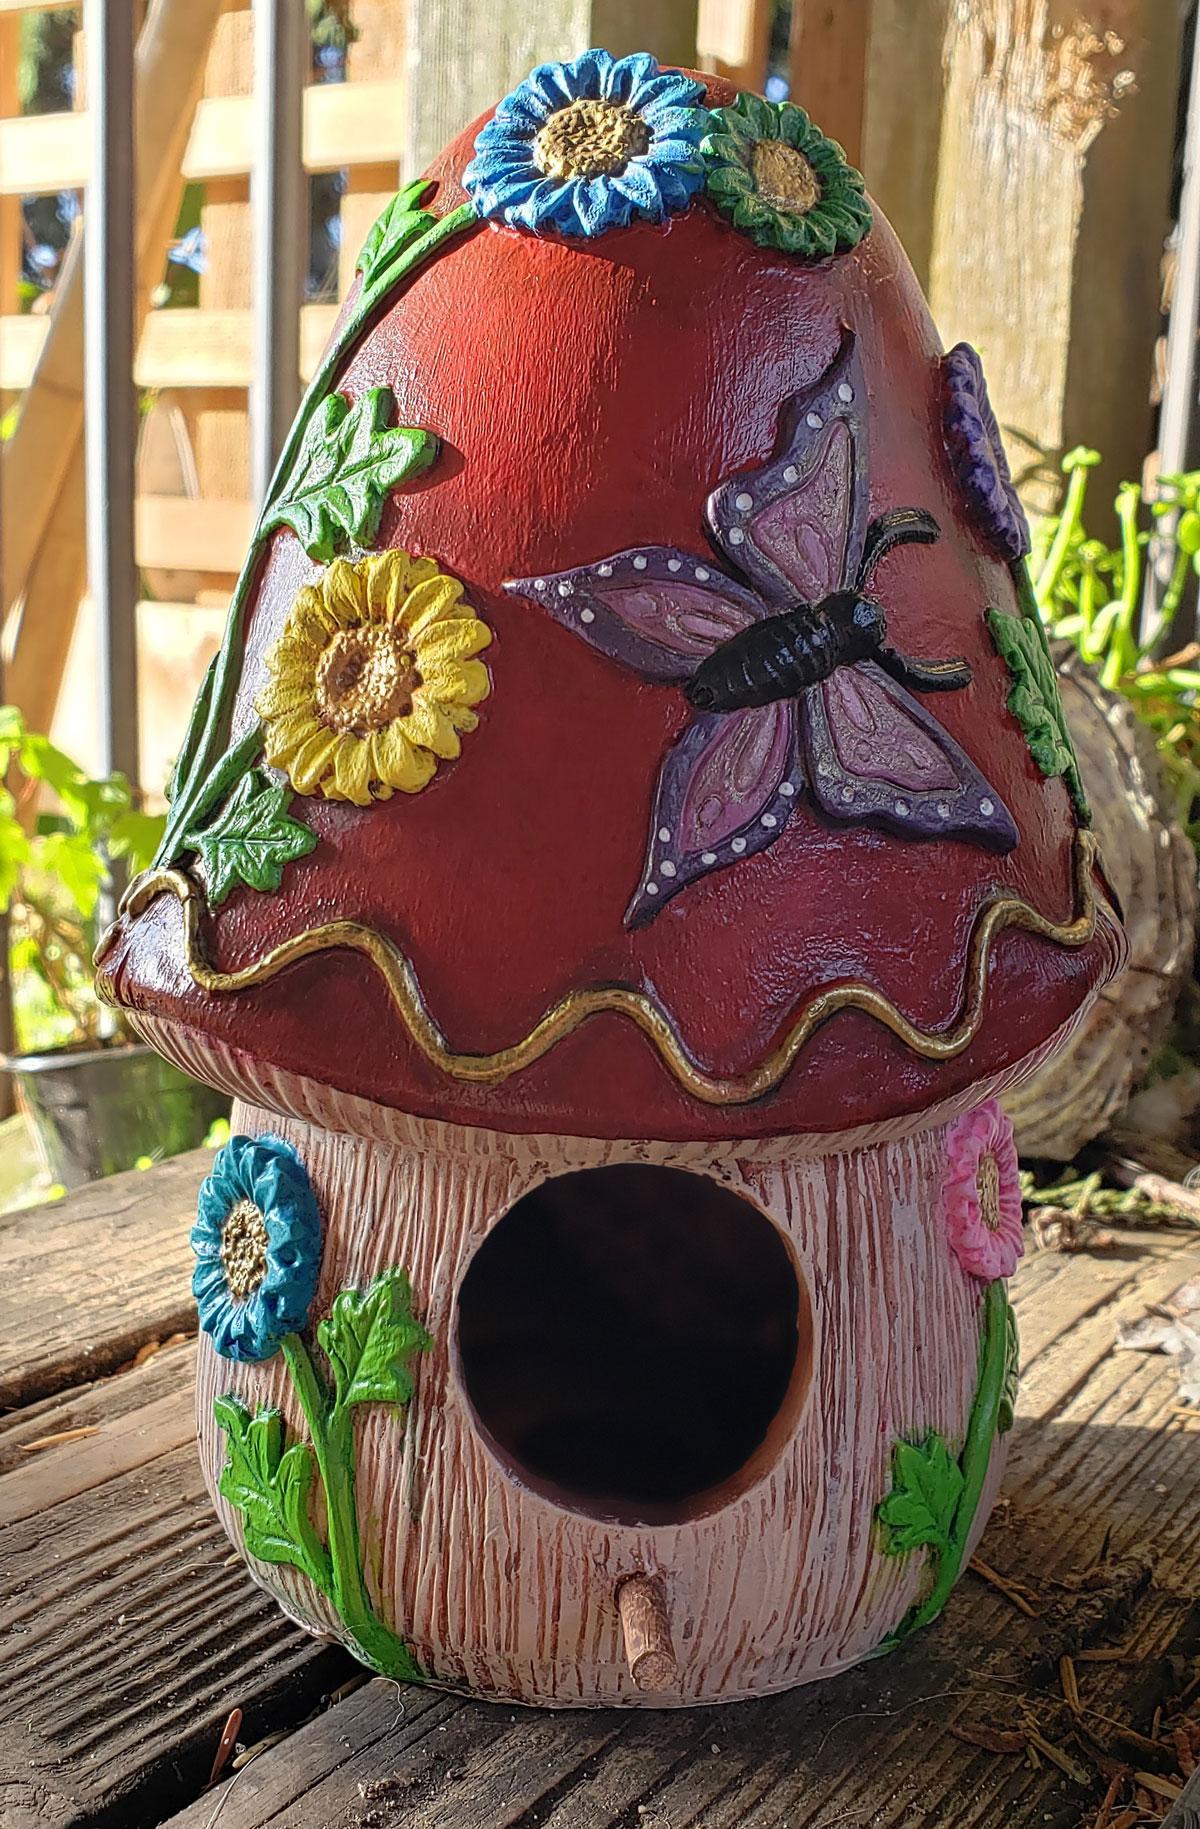 Finished painting of the mushroom birdhouse